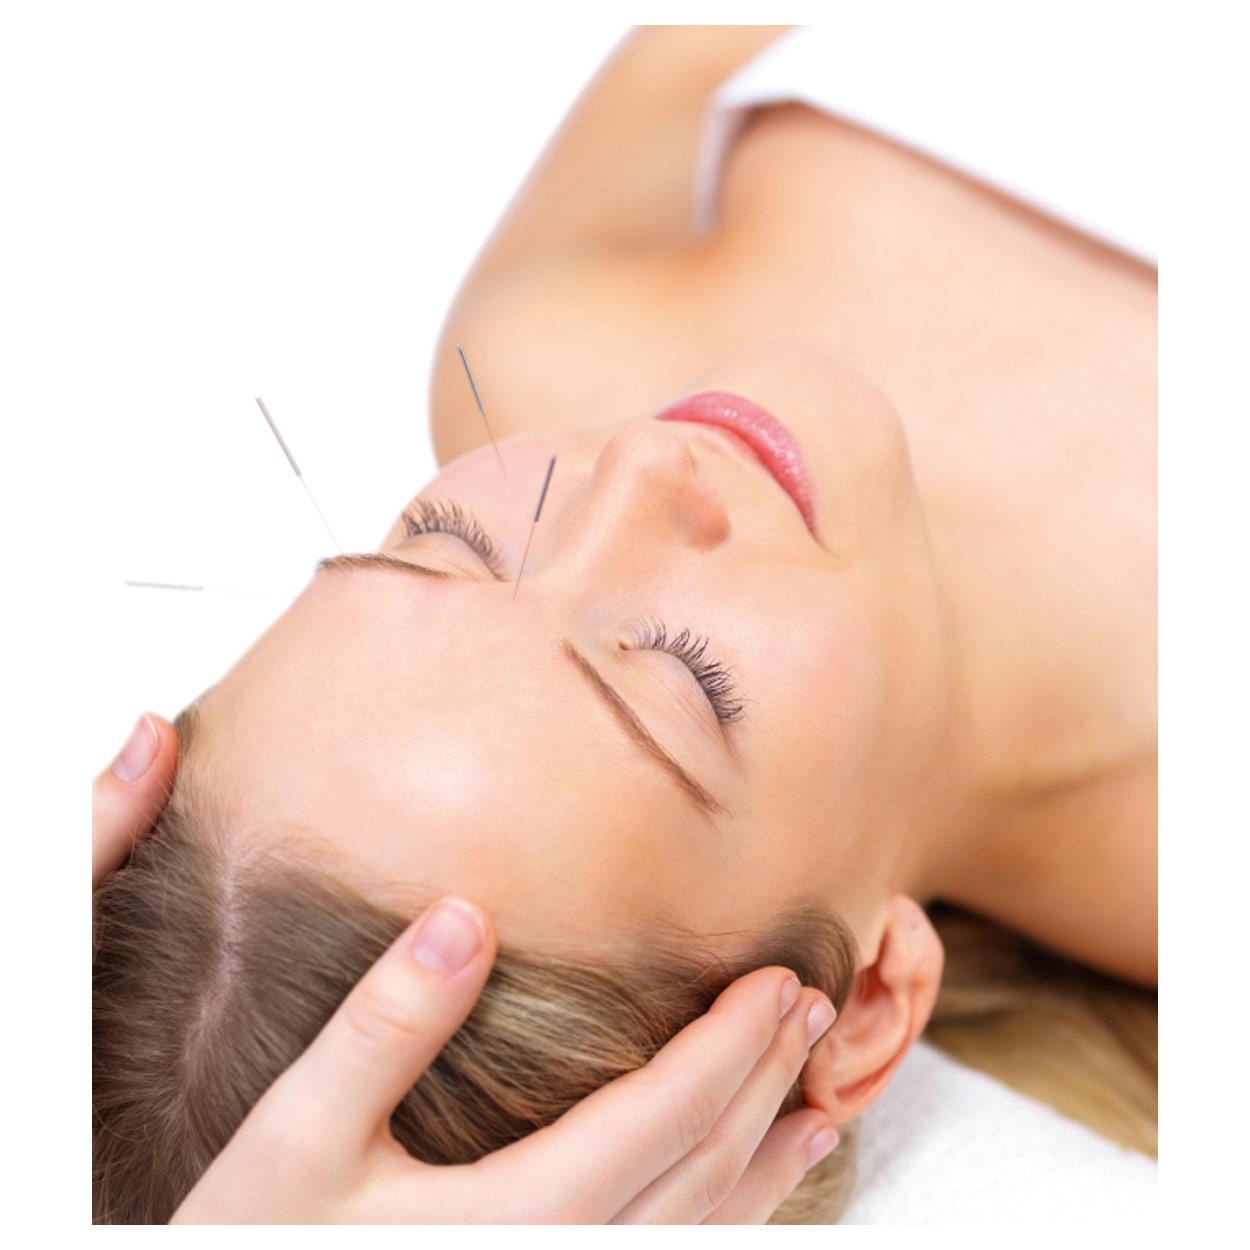 Indexbild 8 - Akupunkturnadeln mit Kunststoffgriff, Akupunktur